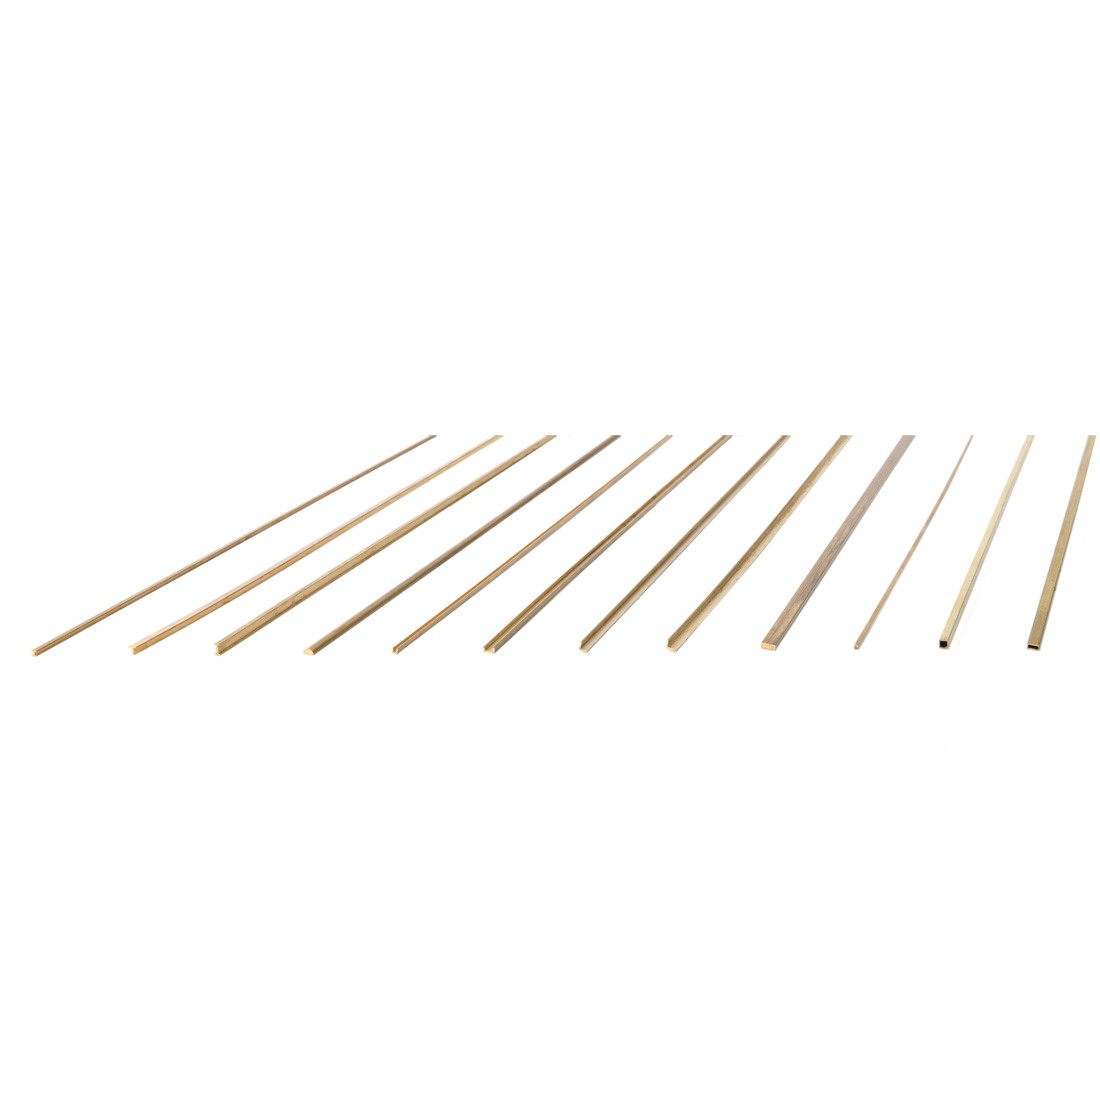 Brass angles 1,5x1,5x0,3